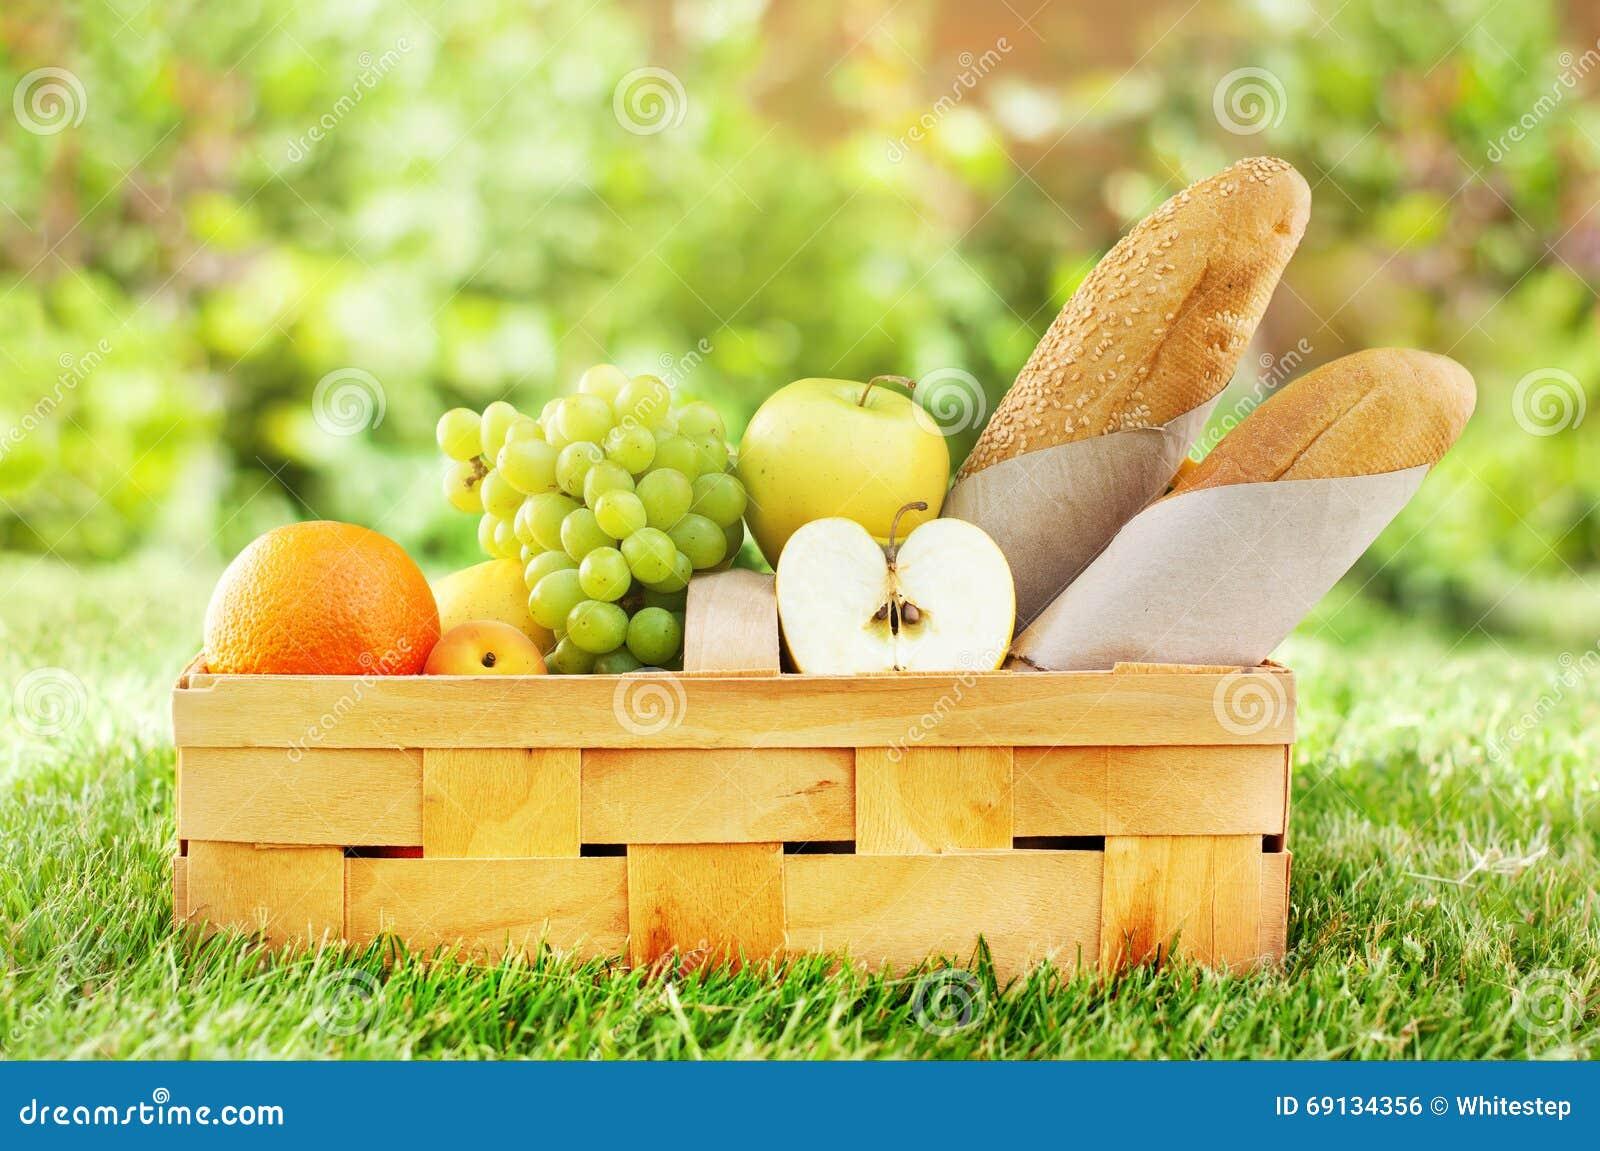 Picnic Basket Fresh Food Bread Bio Organic Fruit